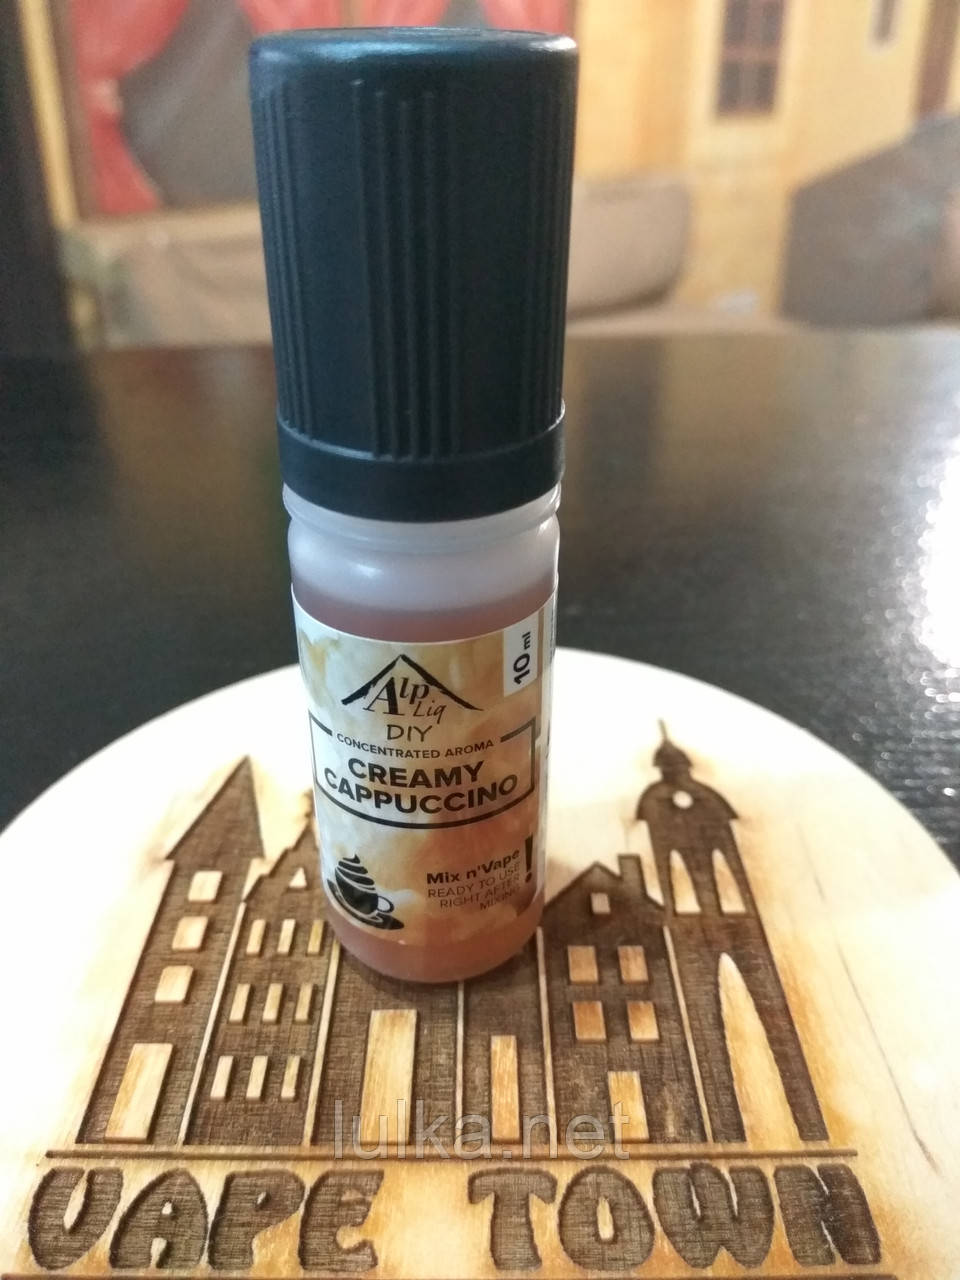 Натуральный ароматизатор AlpLiq Creamy Cappuccino (капучино со сливками) 10мл.